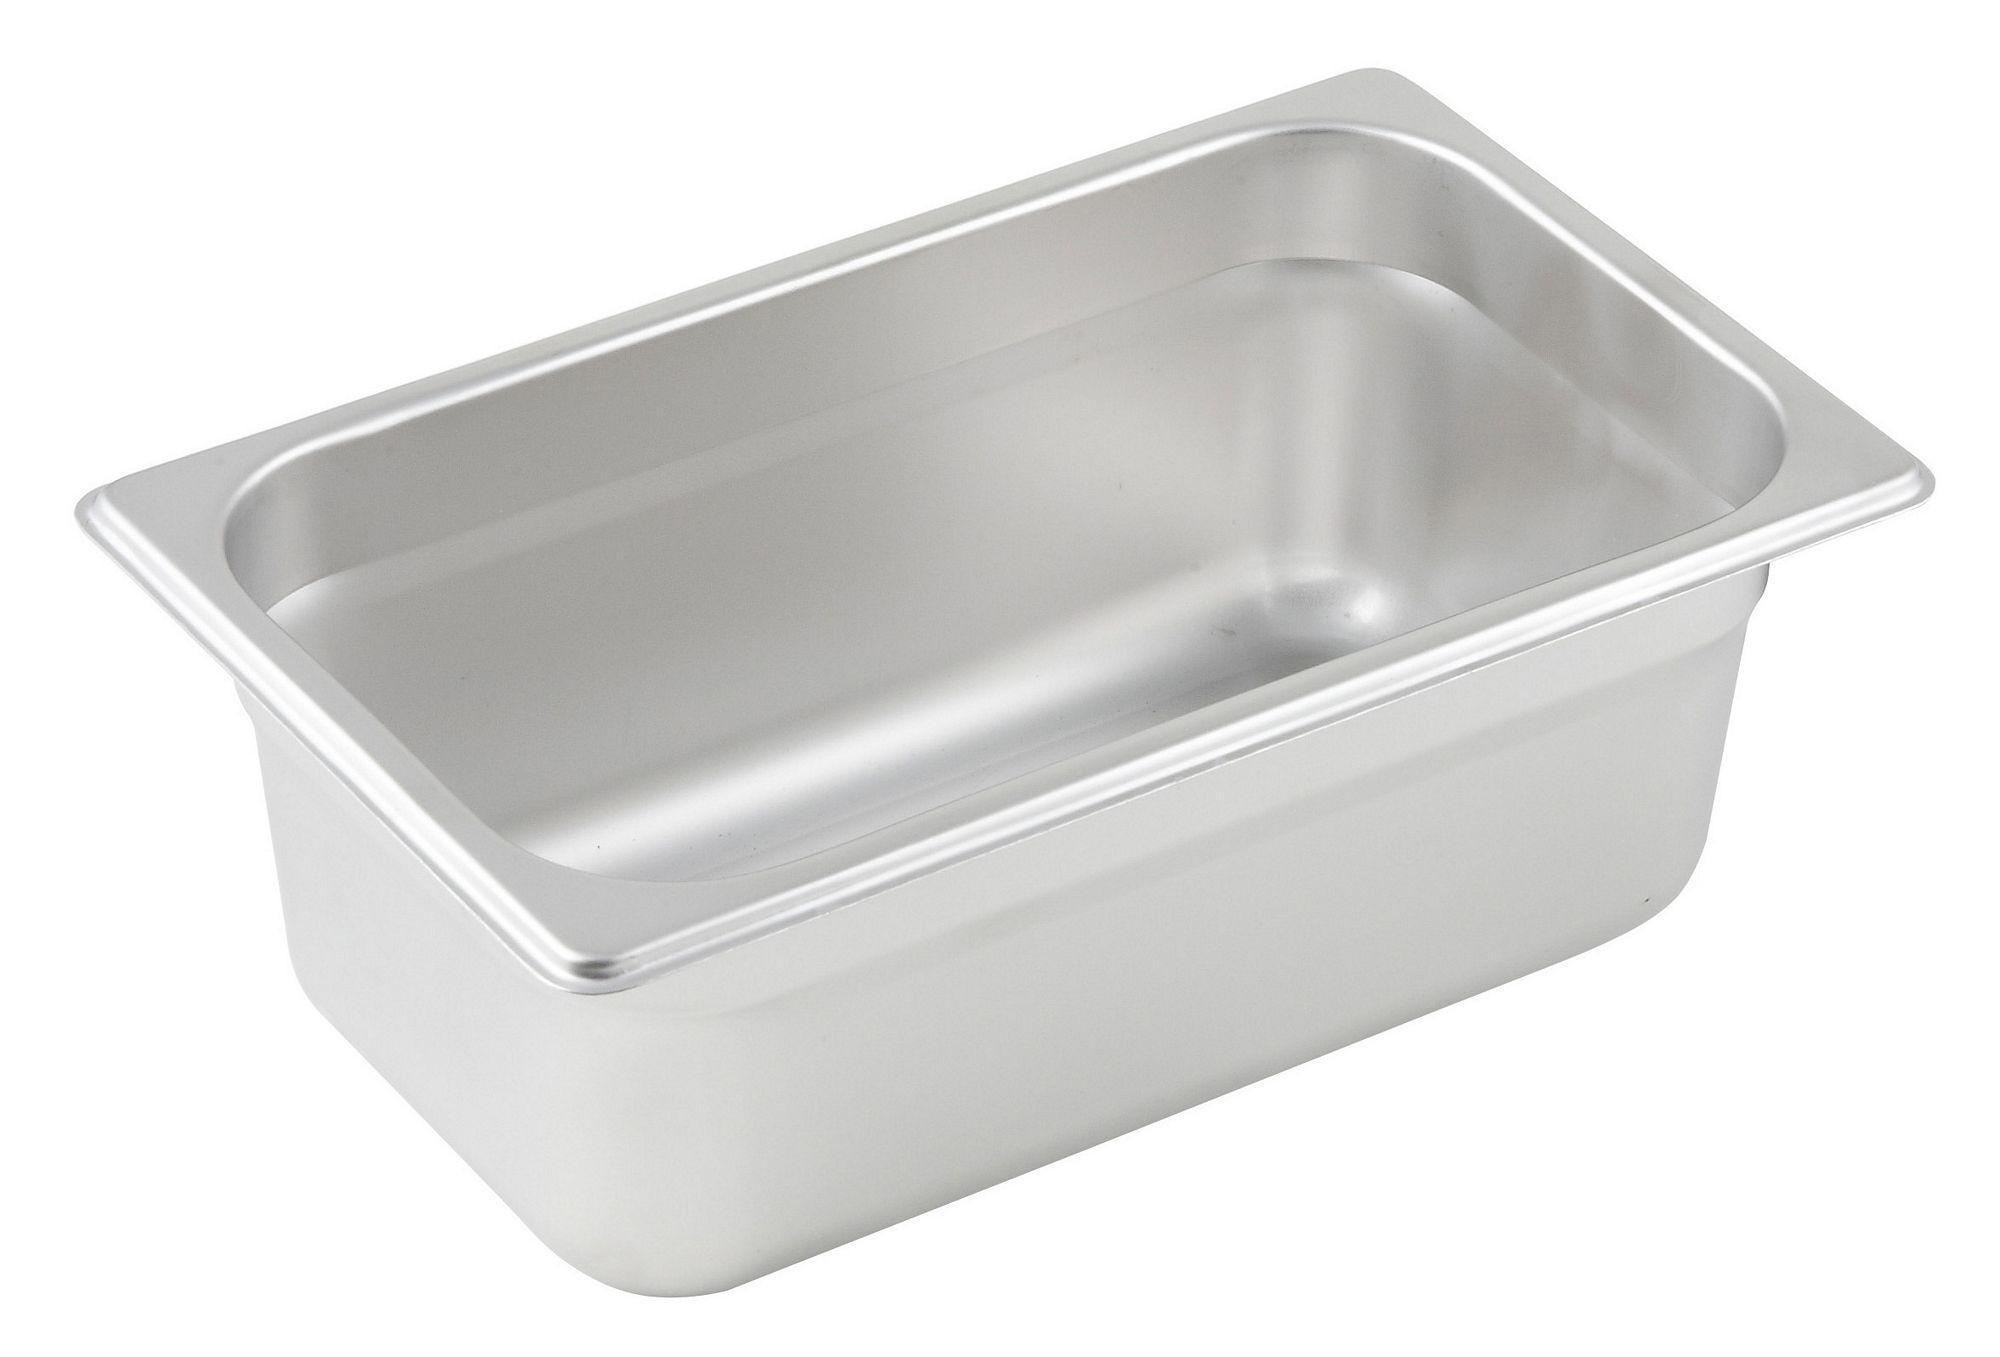 "Winco SPJL-404 1/4 Size Anti-Jam 25 Gauge Steam Table Pan 4"" Deep"